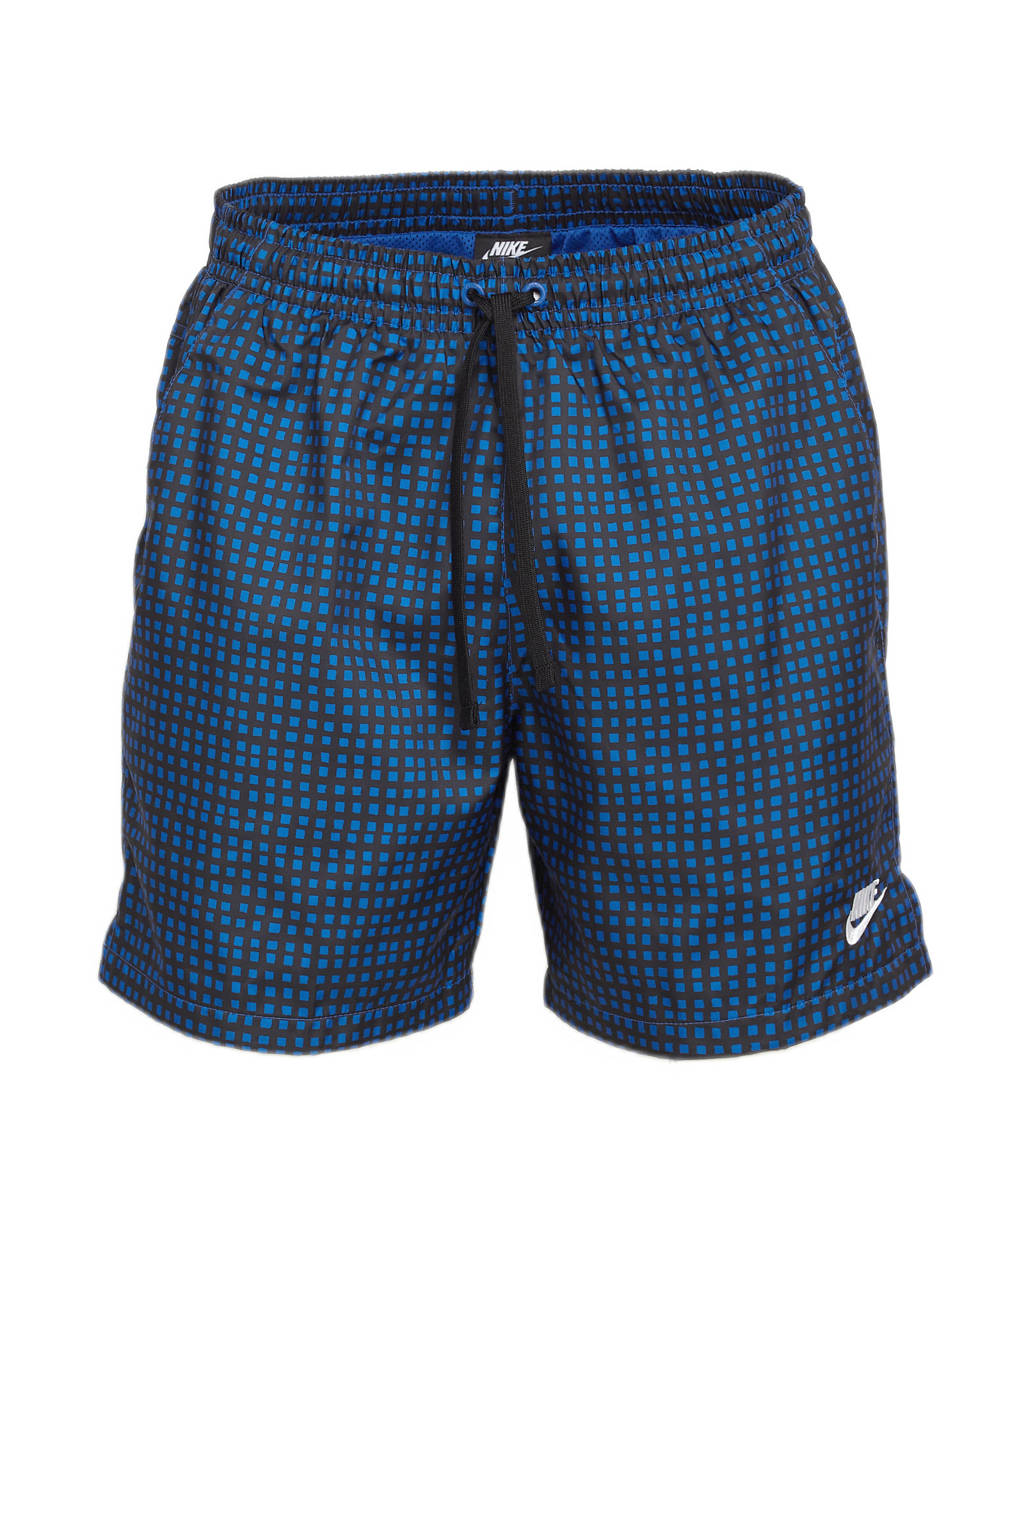 Nike short blauw/zwart, Blauw/zwart